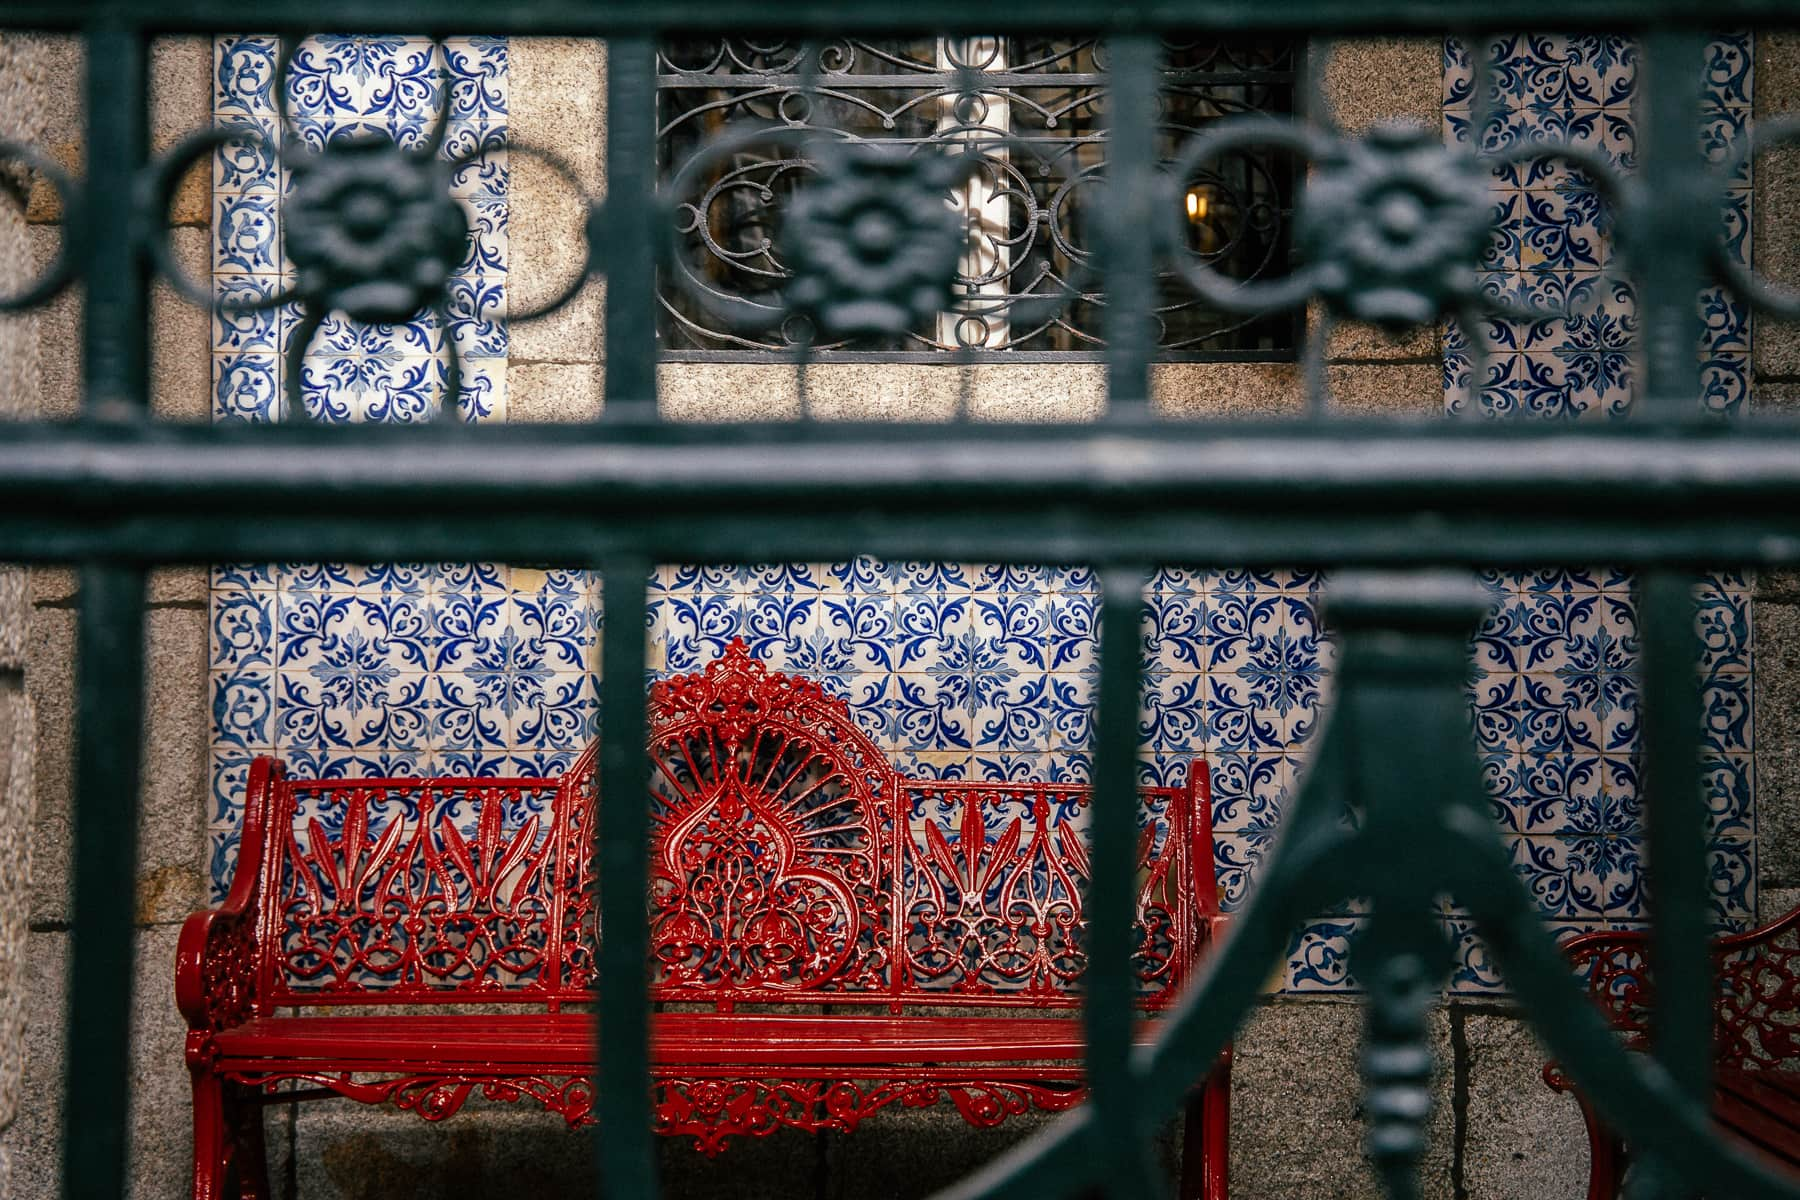 zehn-porto-tipps-fuer-deine-staedtereise-in-portugal-reiseblog-des-belles-choses 39